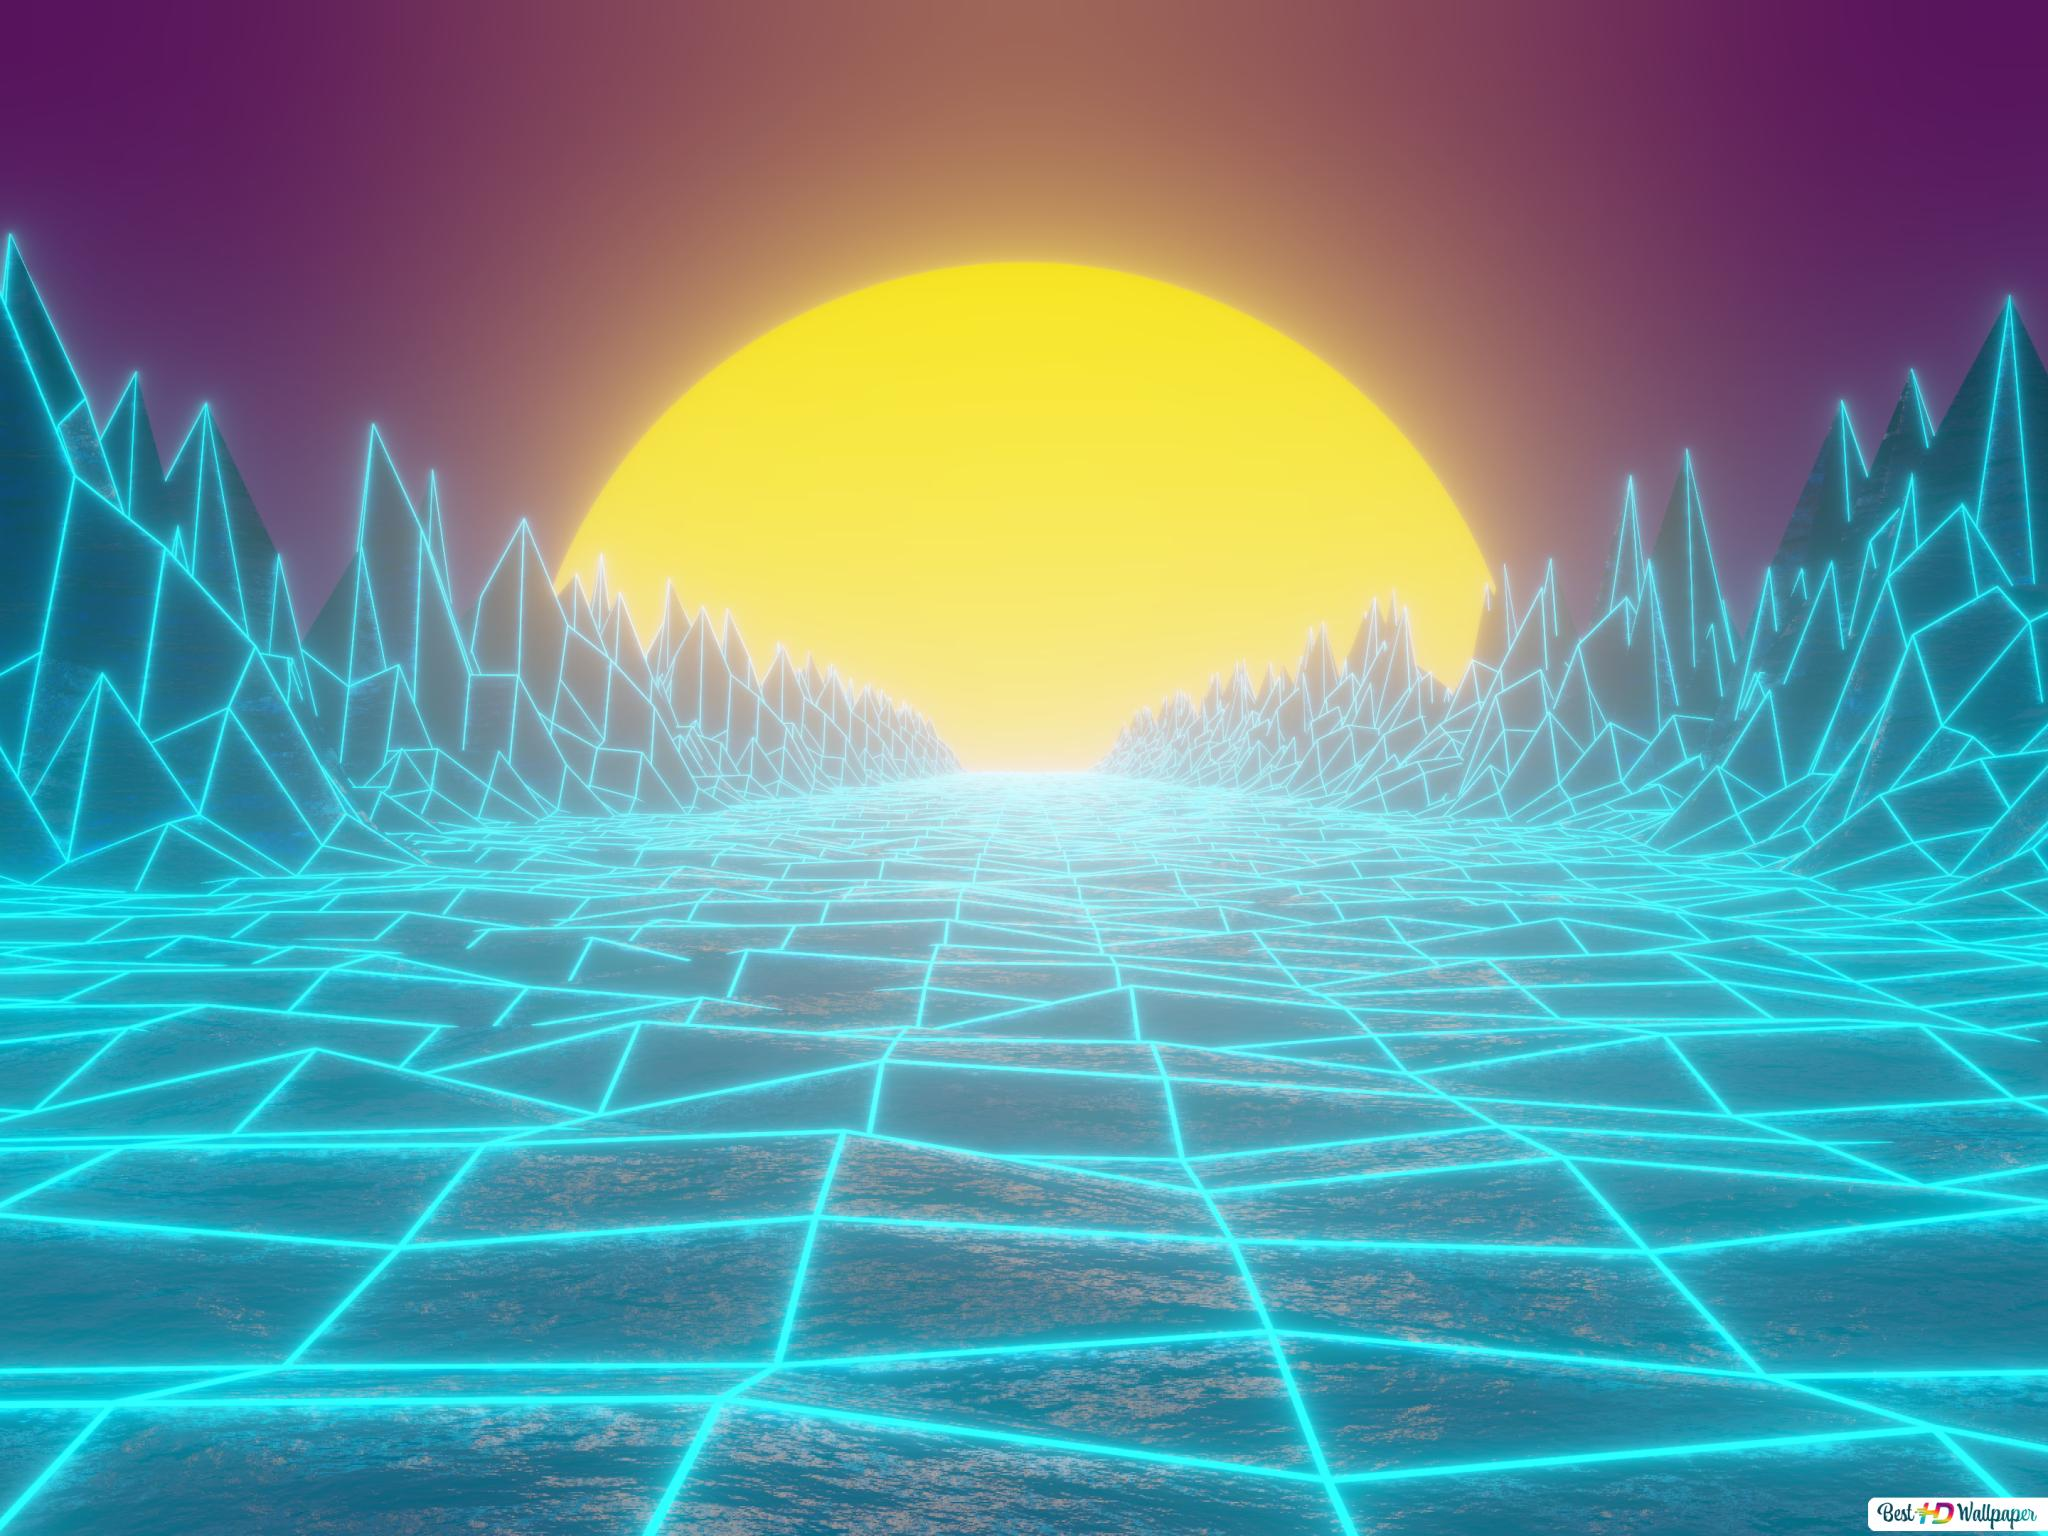 Retrowave HD wallpaper download